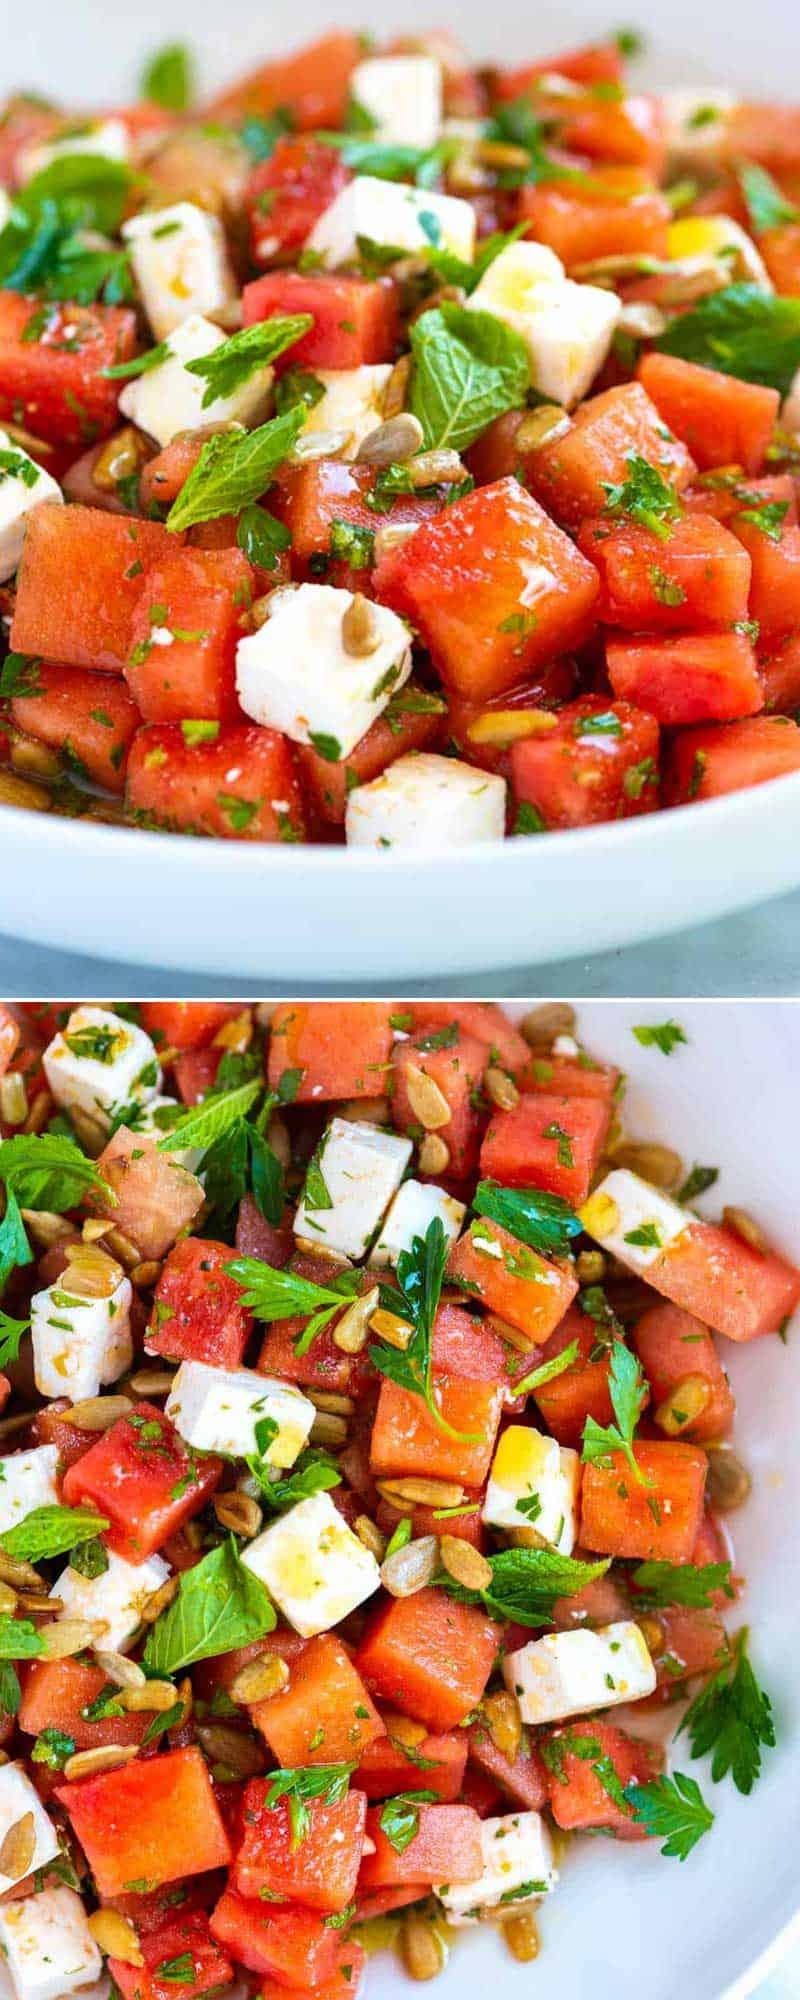 Watermelon Salad Recipe with Feta - Inspired Taste